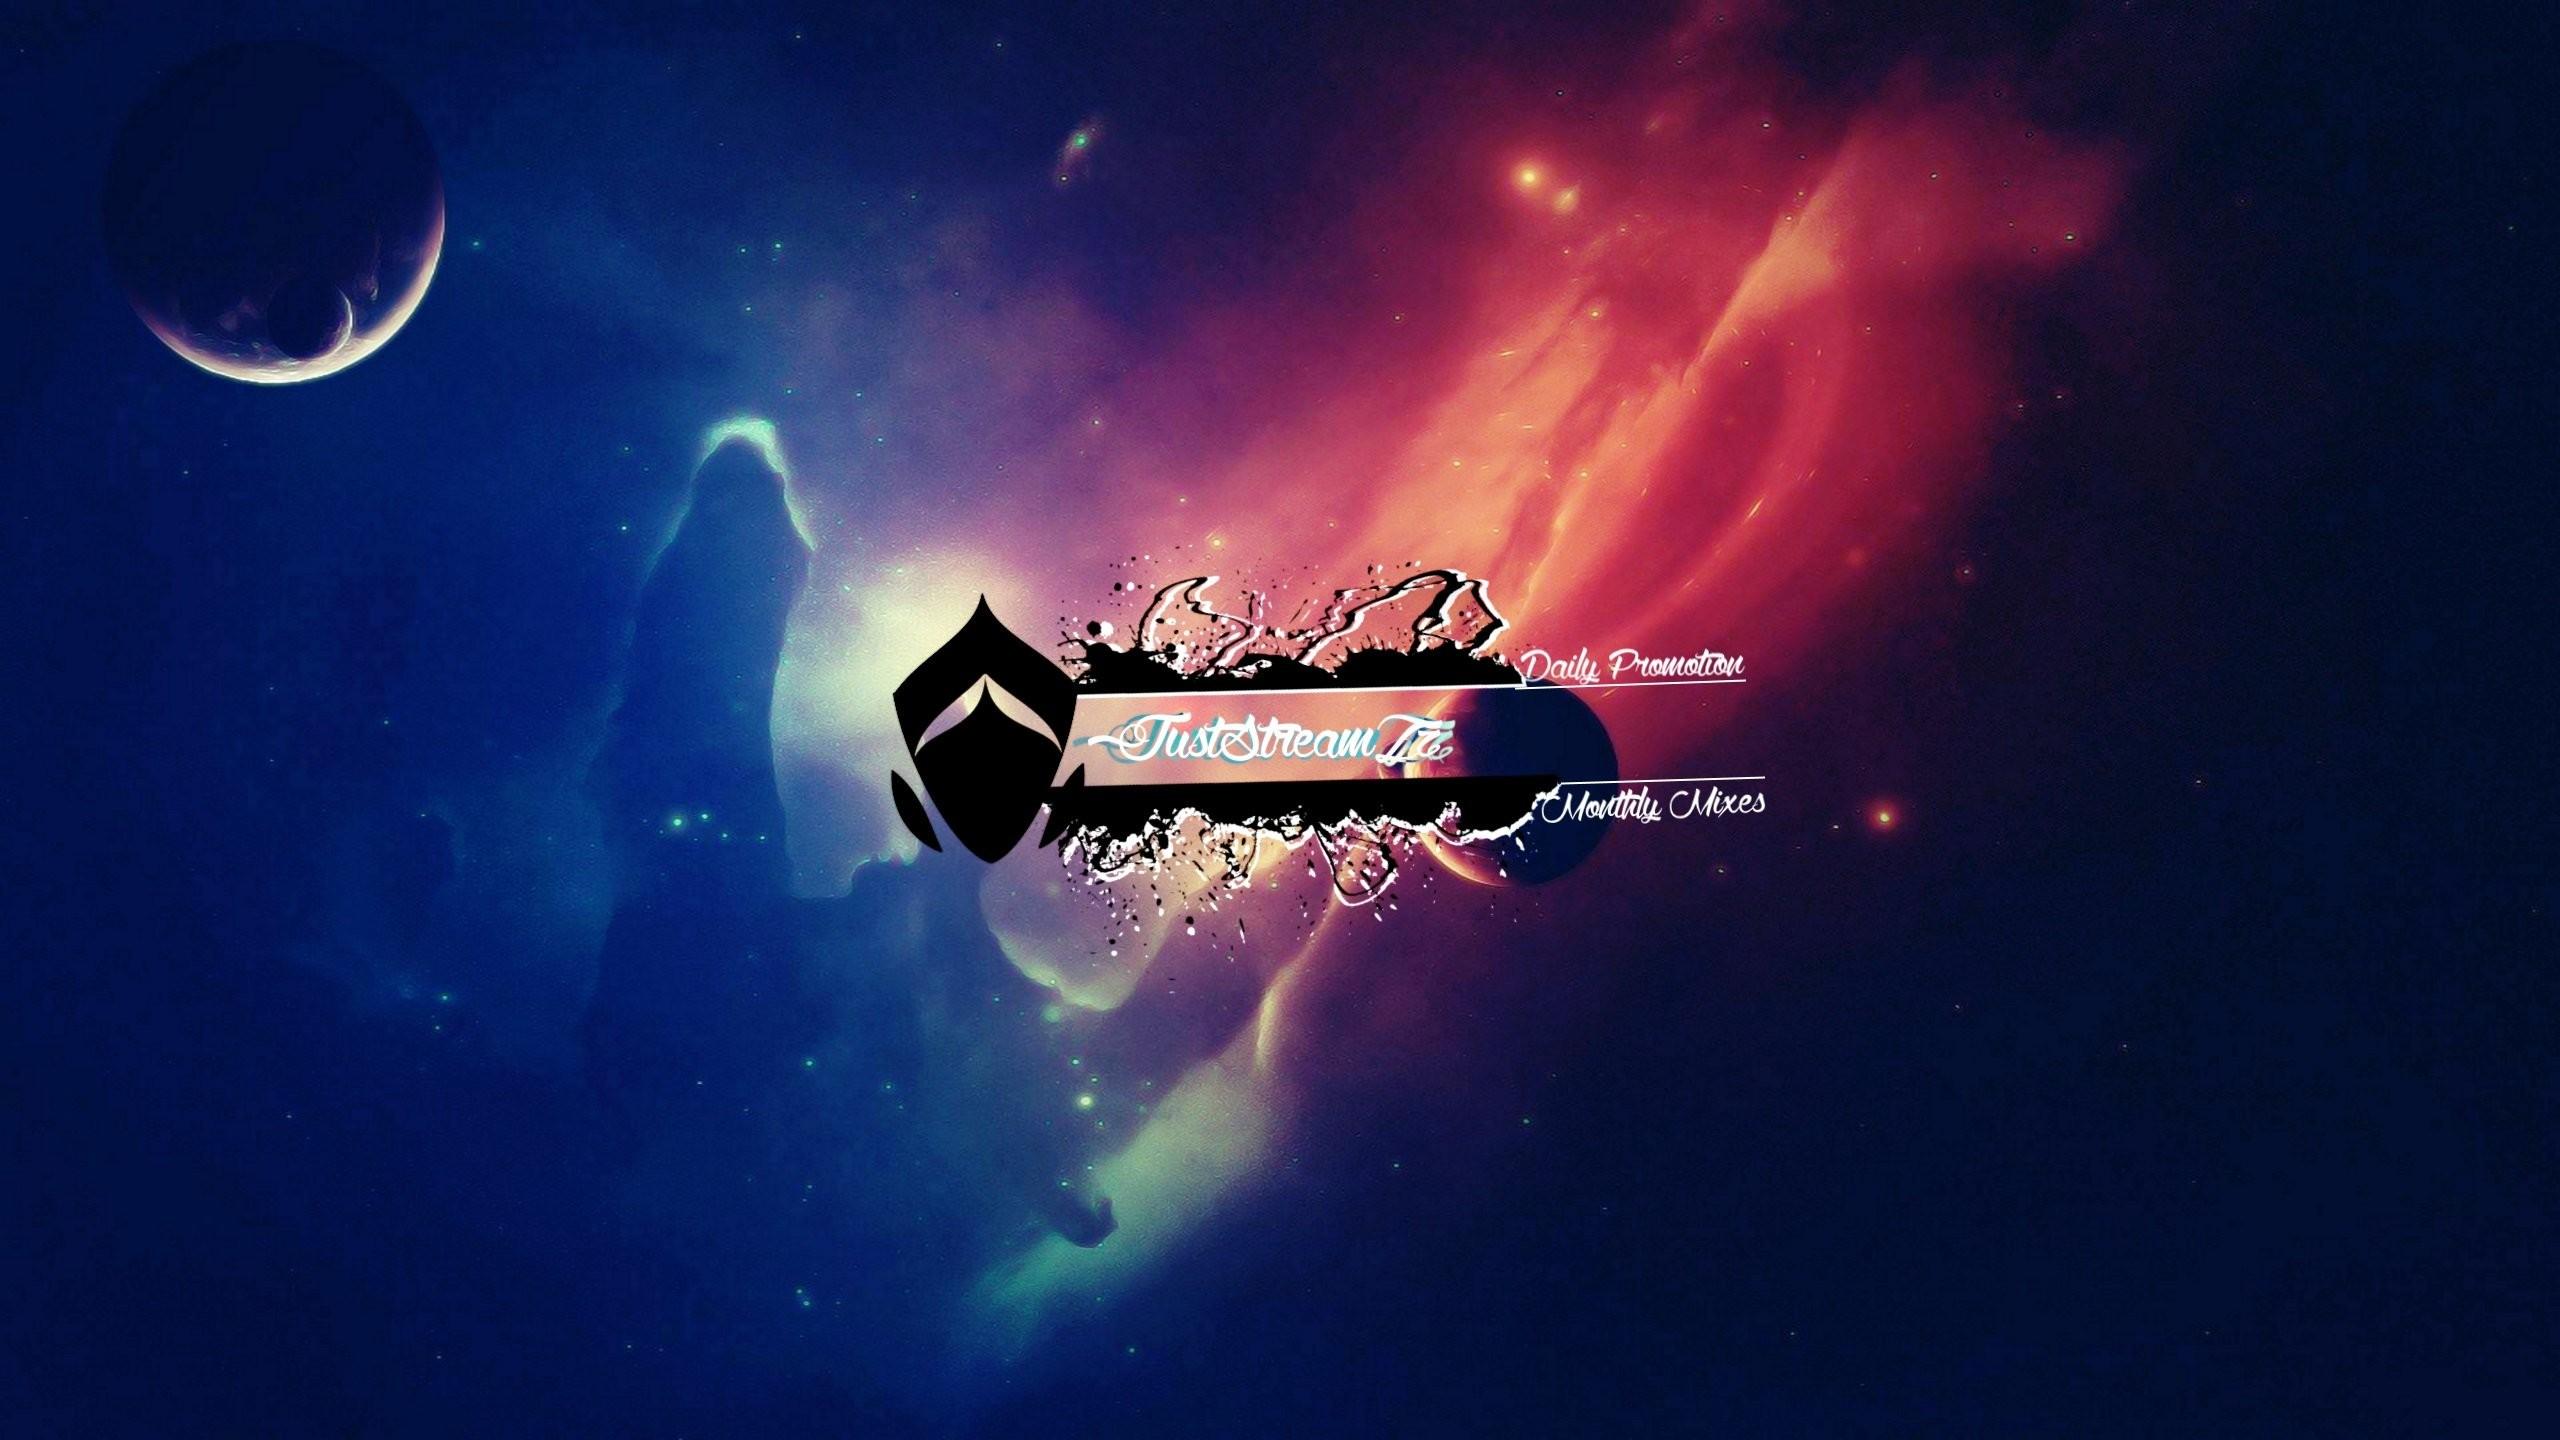 Banner youtube great apollo space universe juststreamzz artwork splatter  wallpaper     501904   WallpaperUP